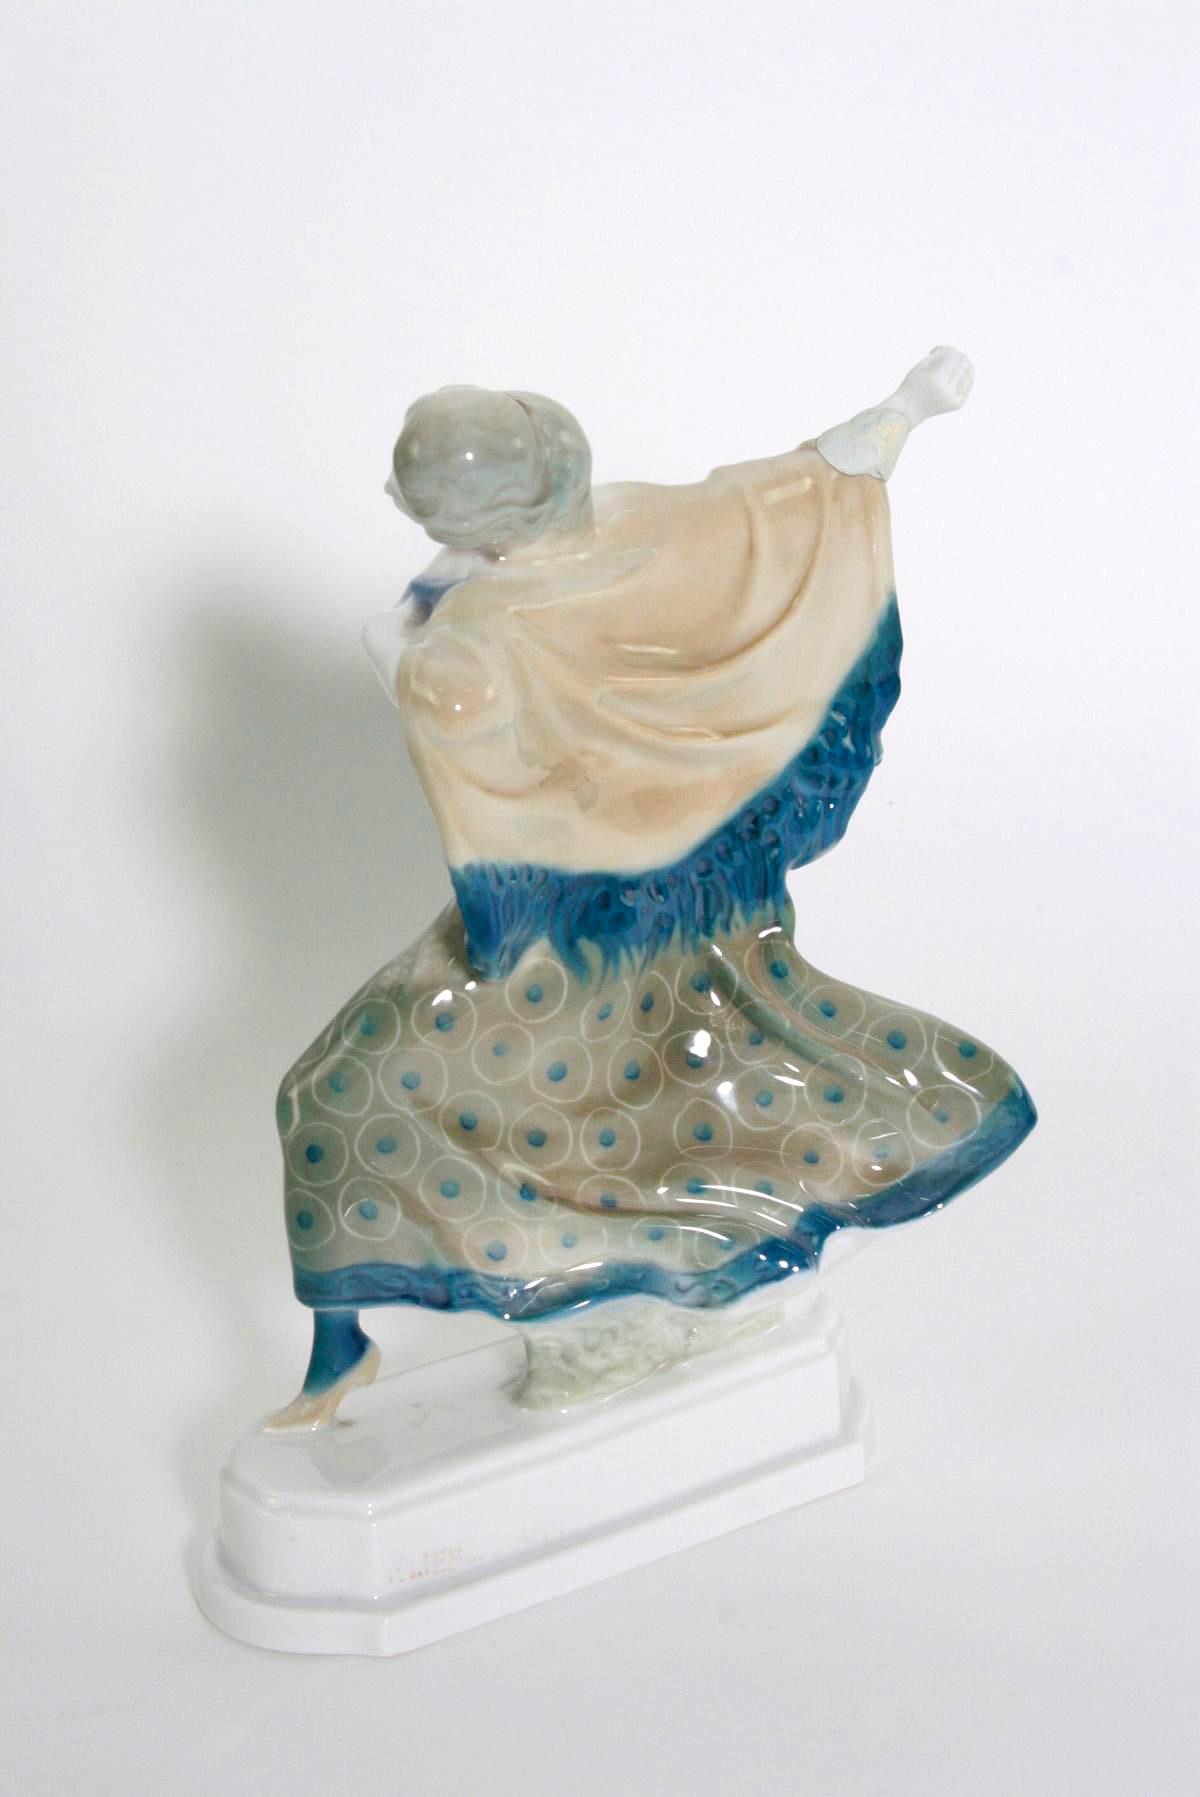 Porzellanskulptur, 'Tänzerin, Carmen', Rosenthal, Kunst-Abteilung, 1920er Jahre-3